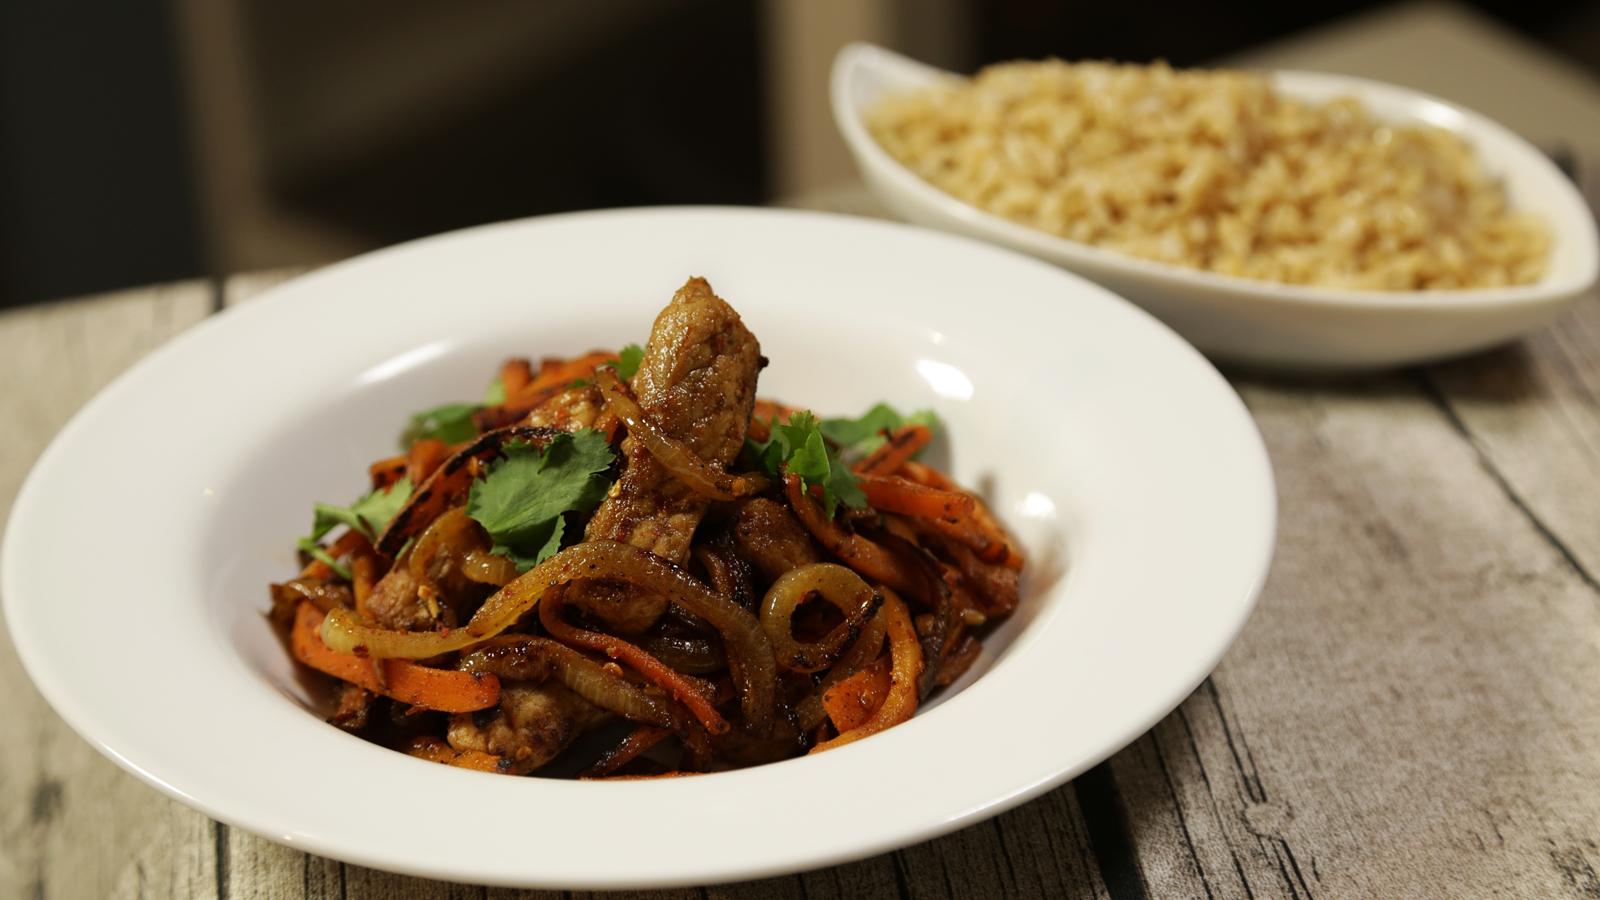 Spicy Pork & Carrot Stir Fry: Operation Trans